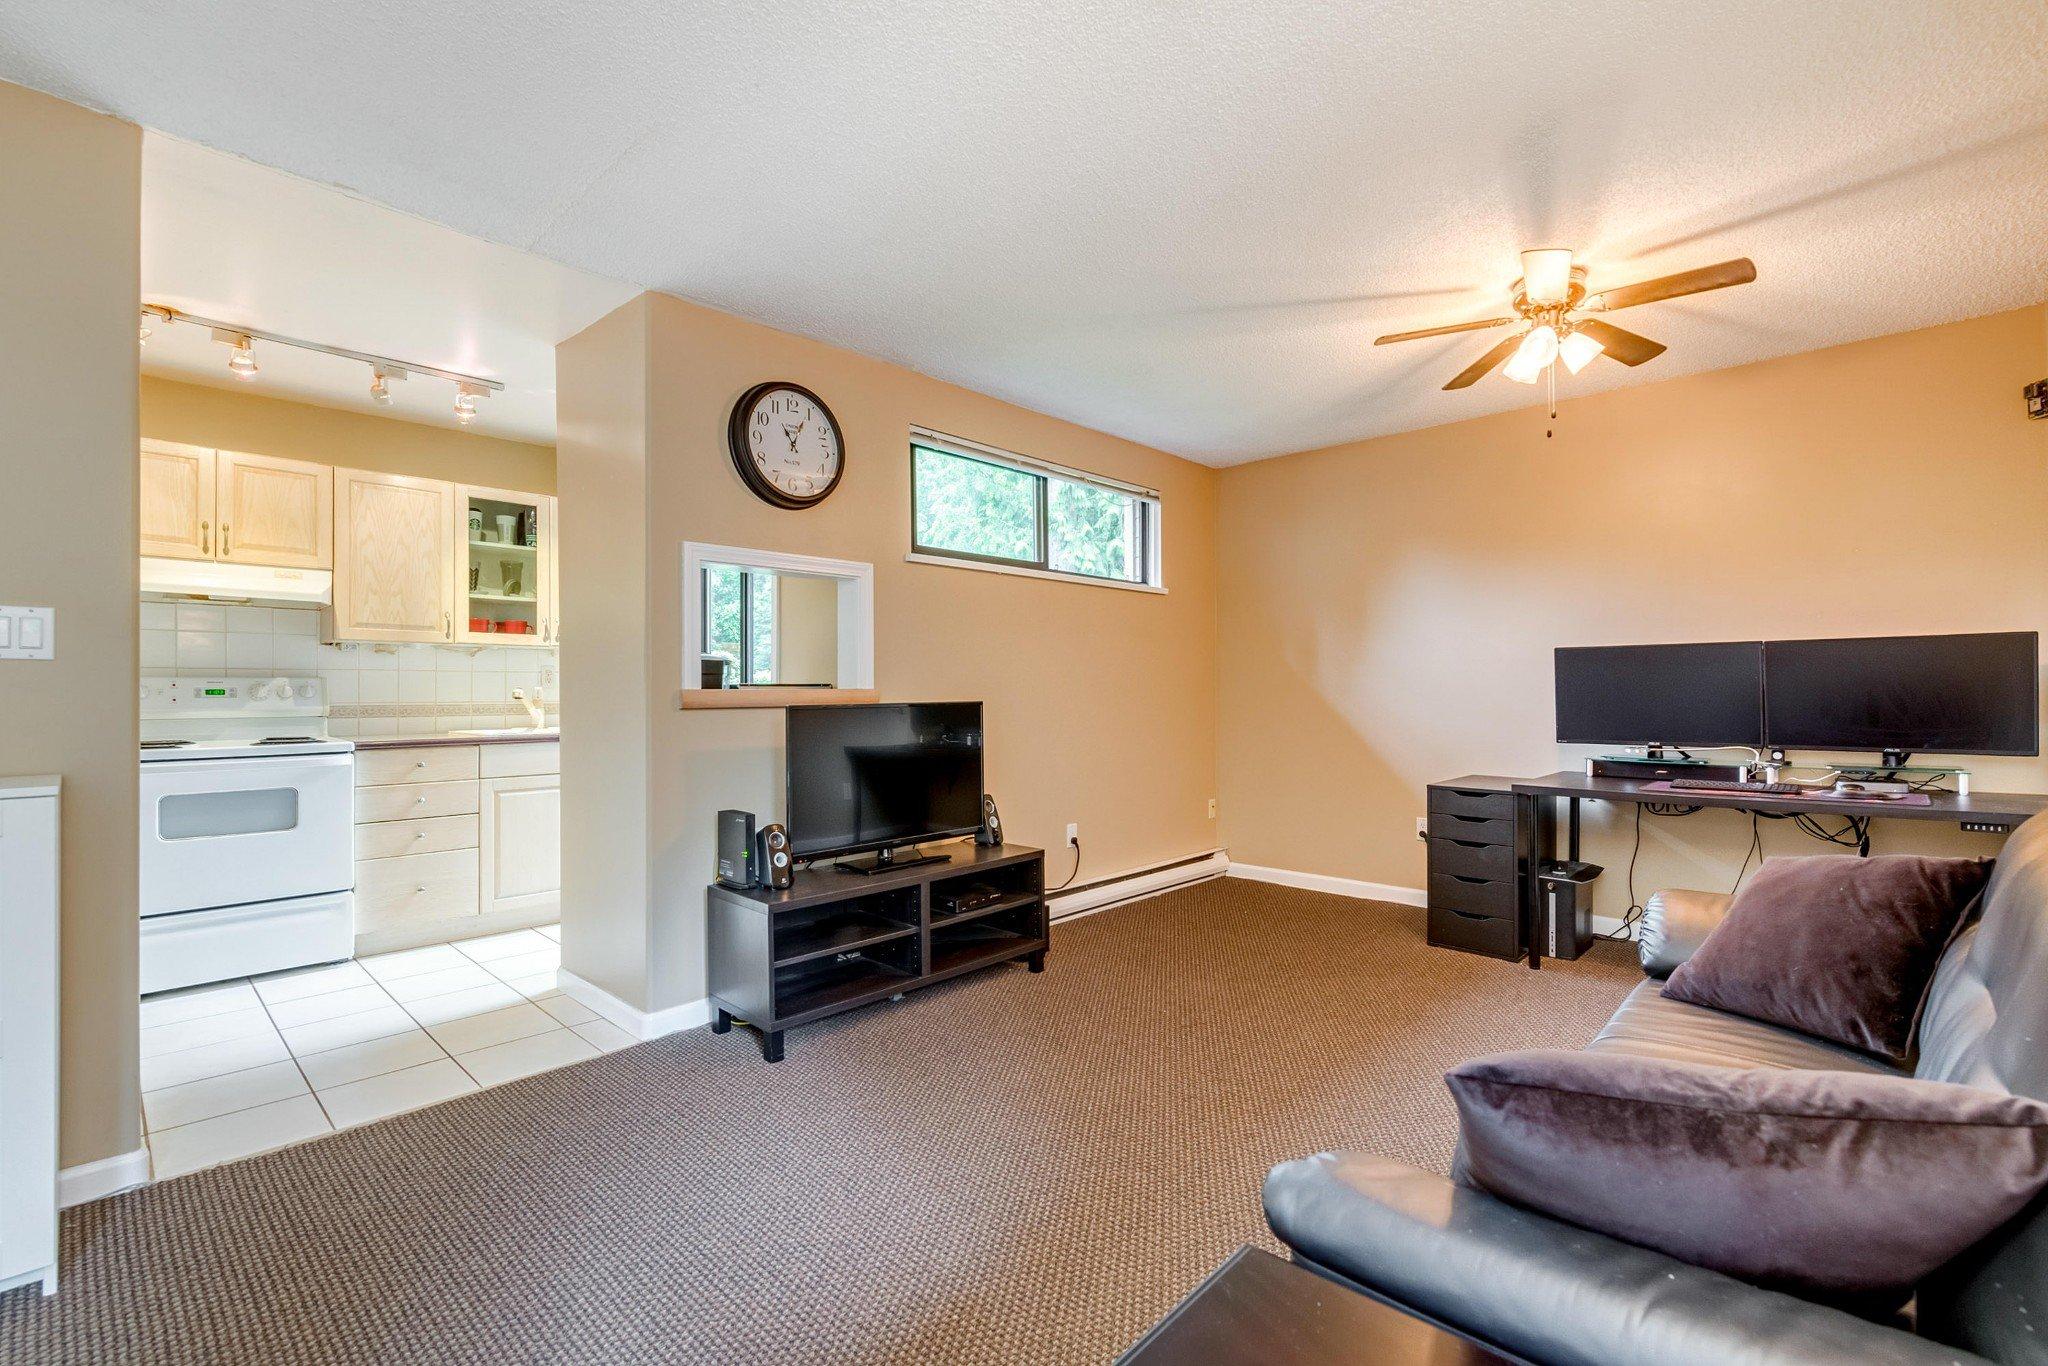 Main Photo: 303 8686 Centaurus Circle in Burnaby: Simon Fraser Hills Condo for sale (Burnaby North)  : MLS®# R2466482